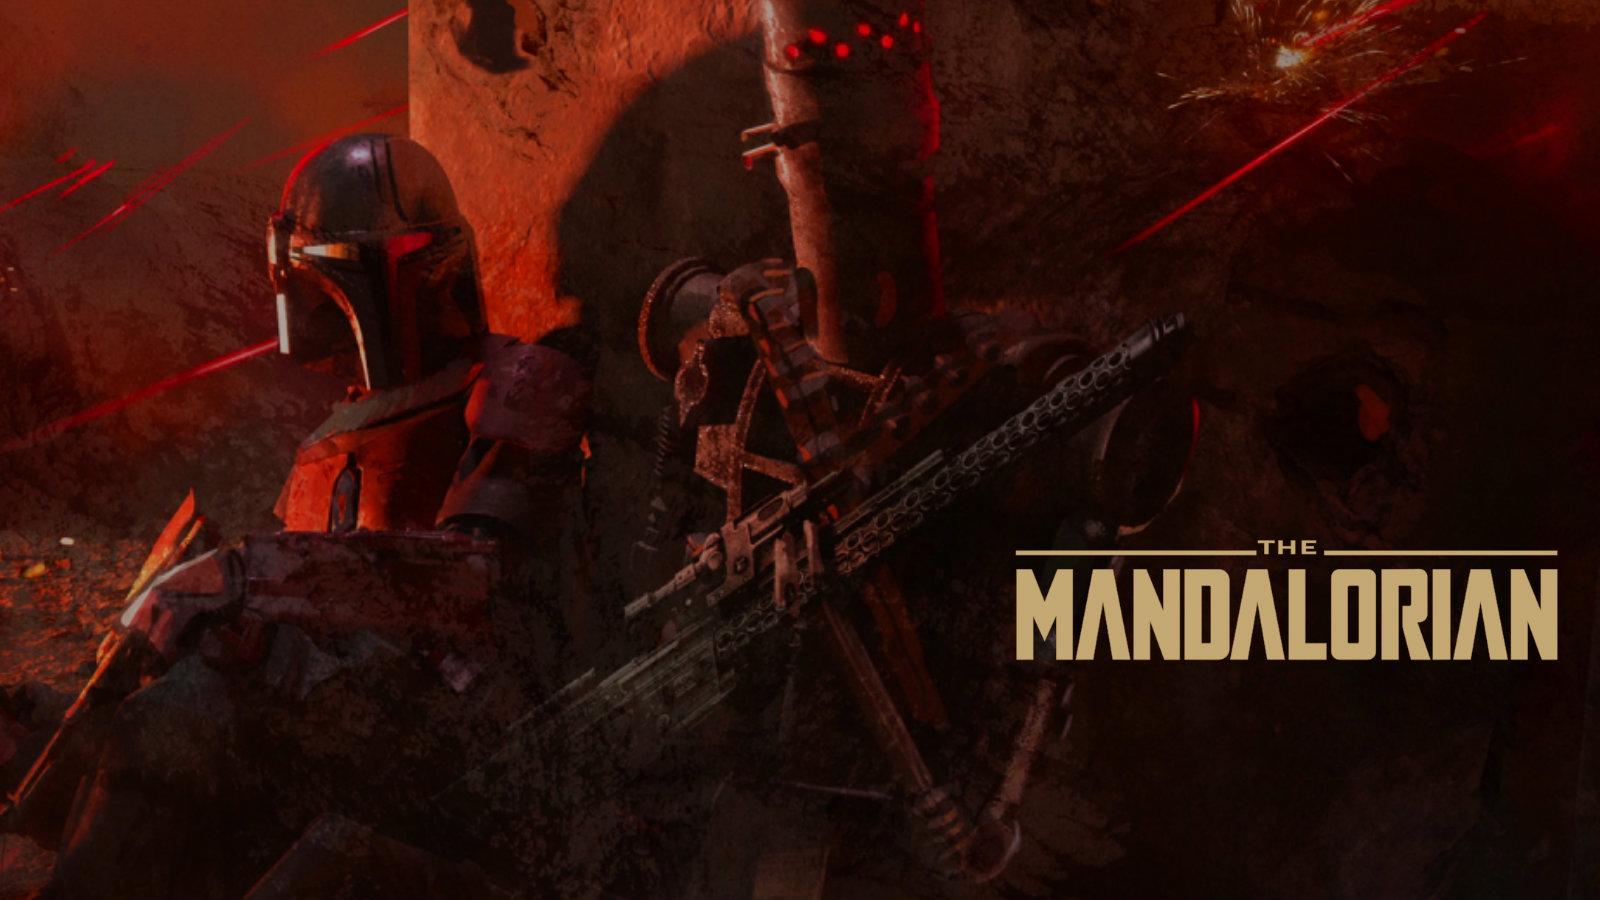 The Mandalorian Season One star wars 43208556 1600 900